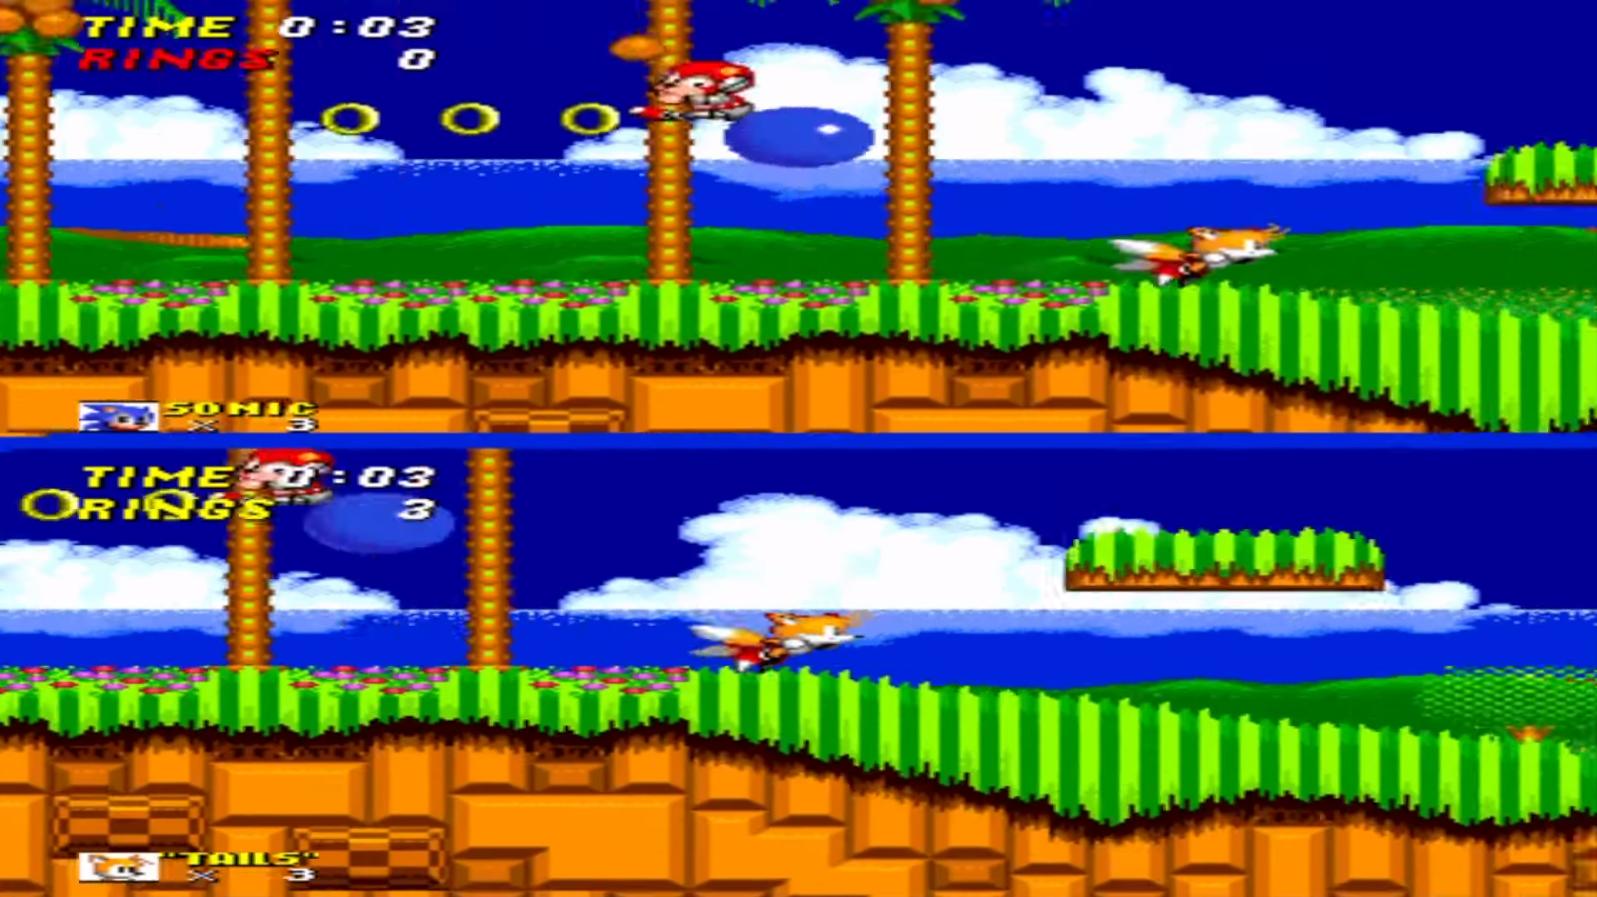 Old But Gold #35 - Sonic the Hedgehog 2 (e i suoi amici) 2